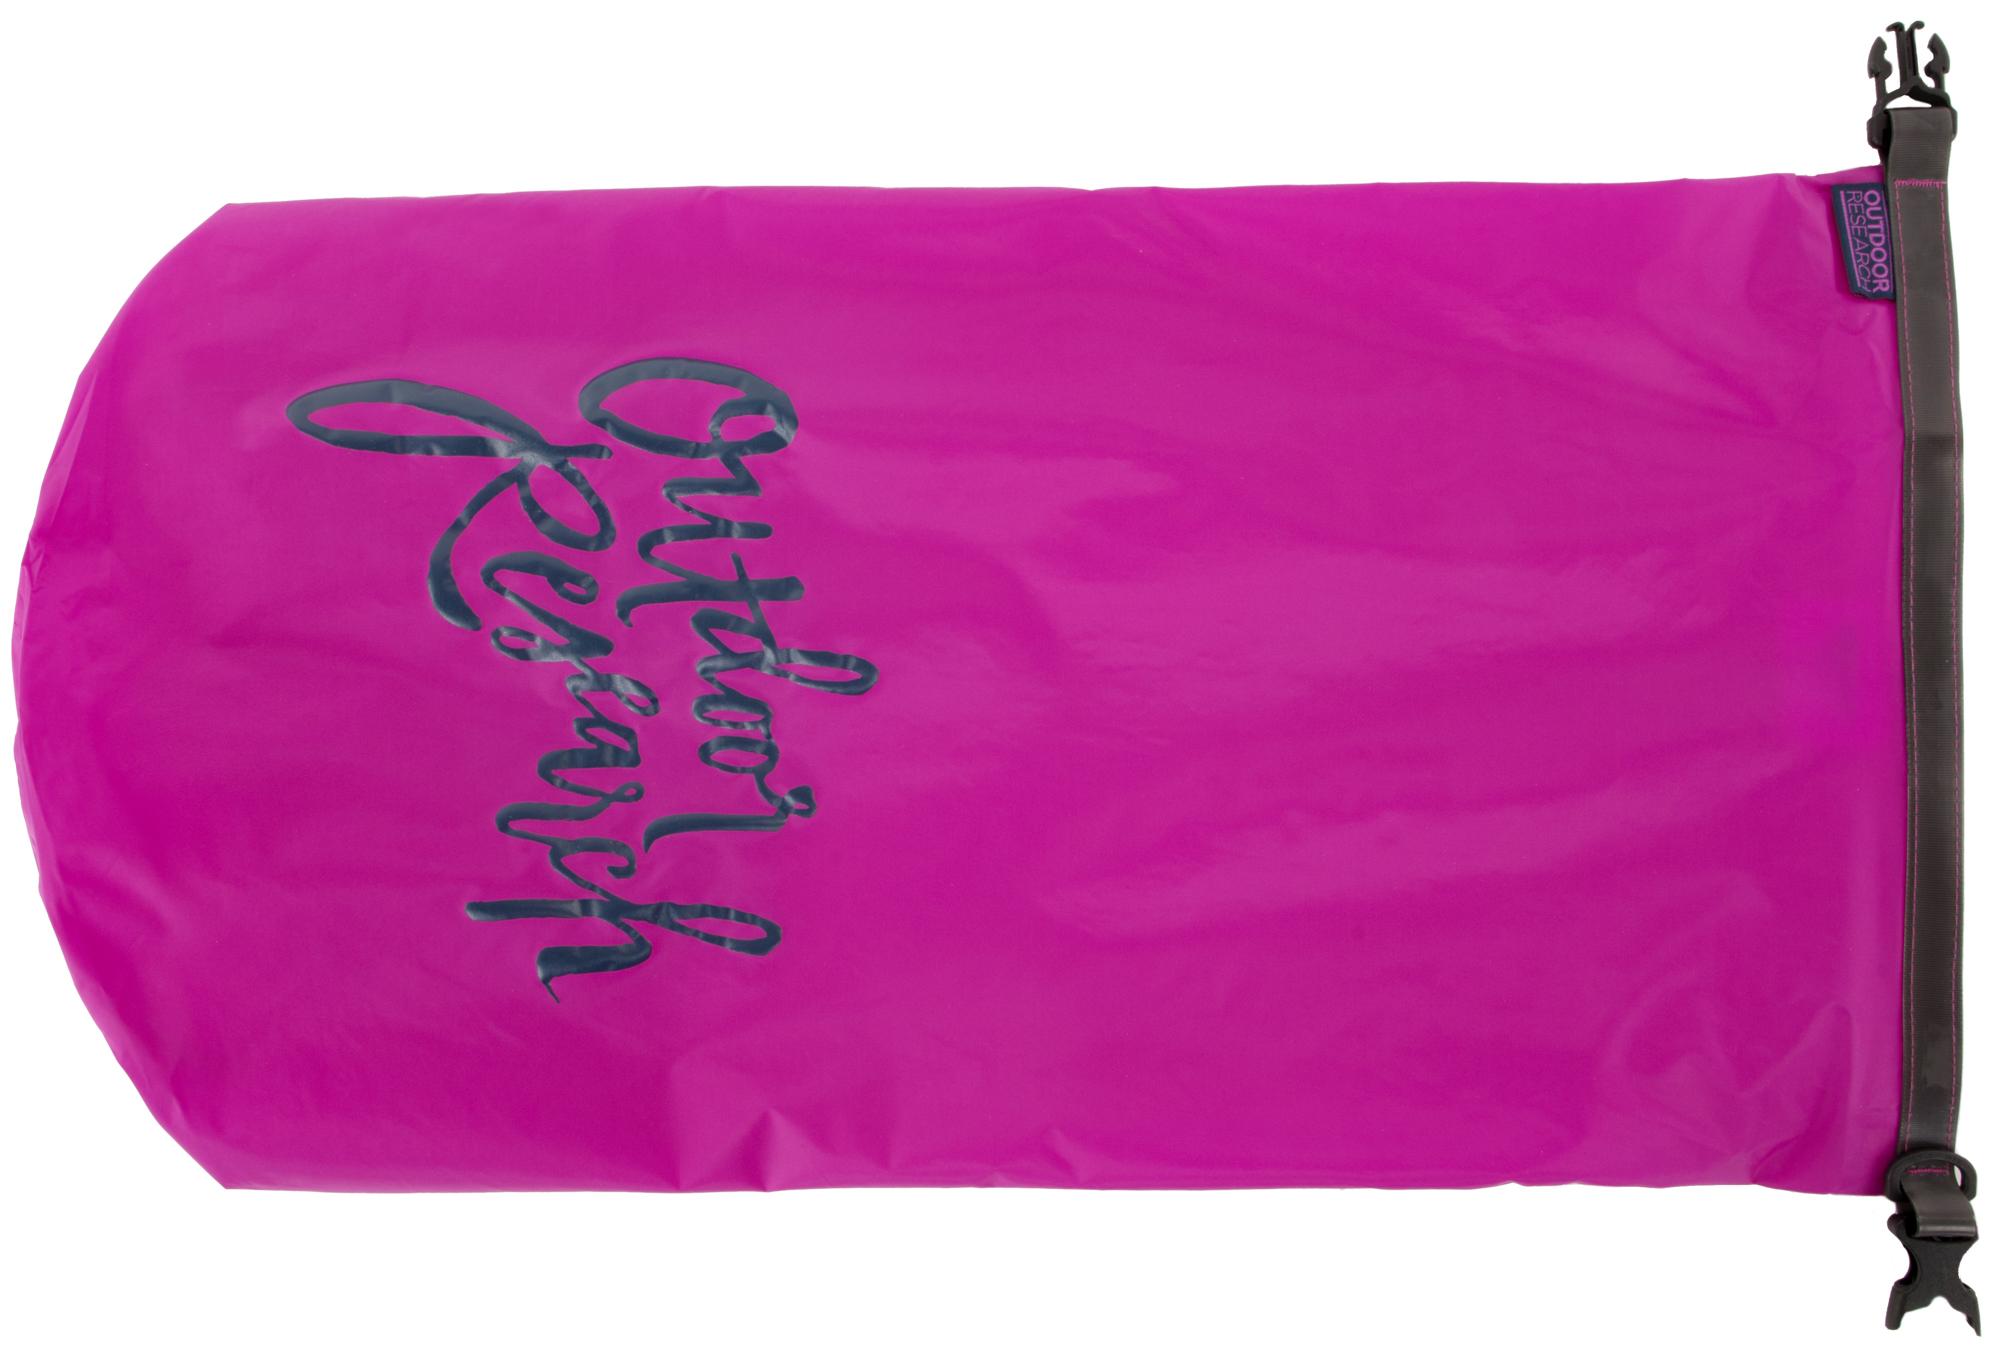 OUTDOOR RESEARCH Гермомешок OUTDOOR Alpenglow, 15 л outdoor research гермомешок outdoor script dry sack 10 л